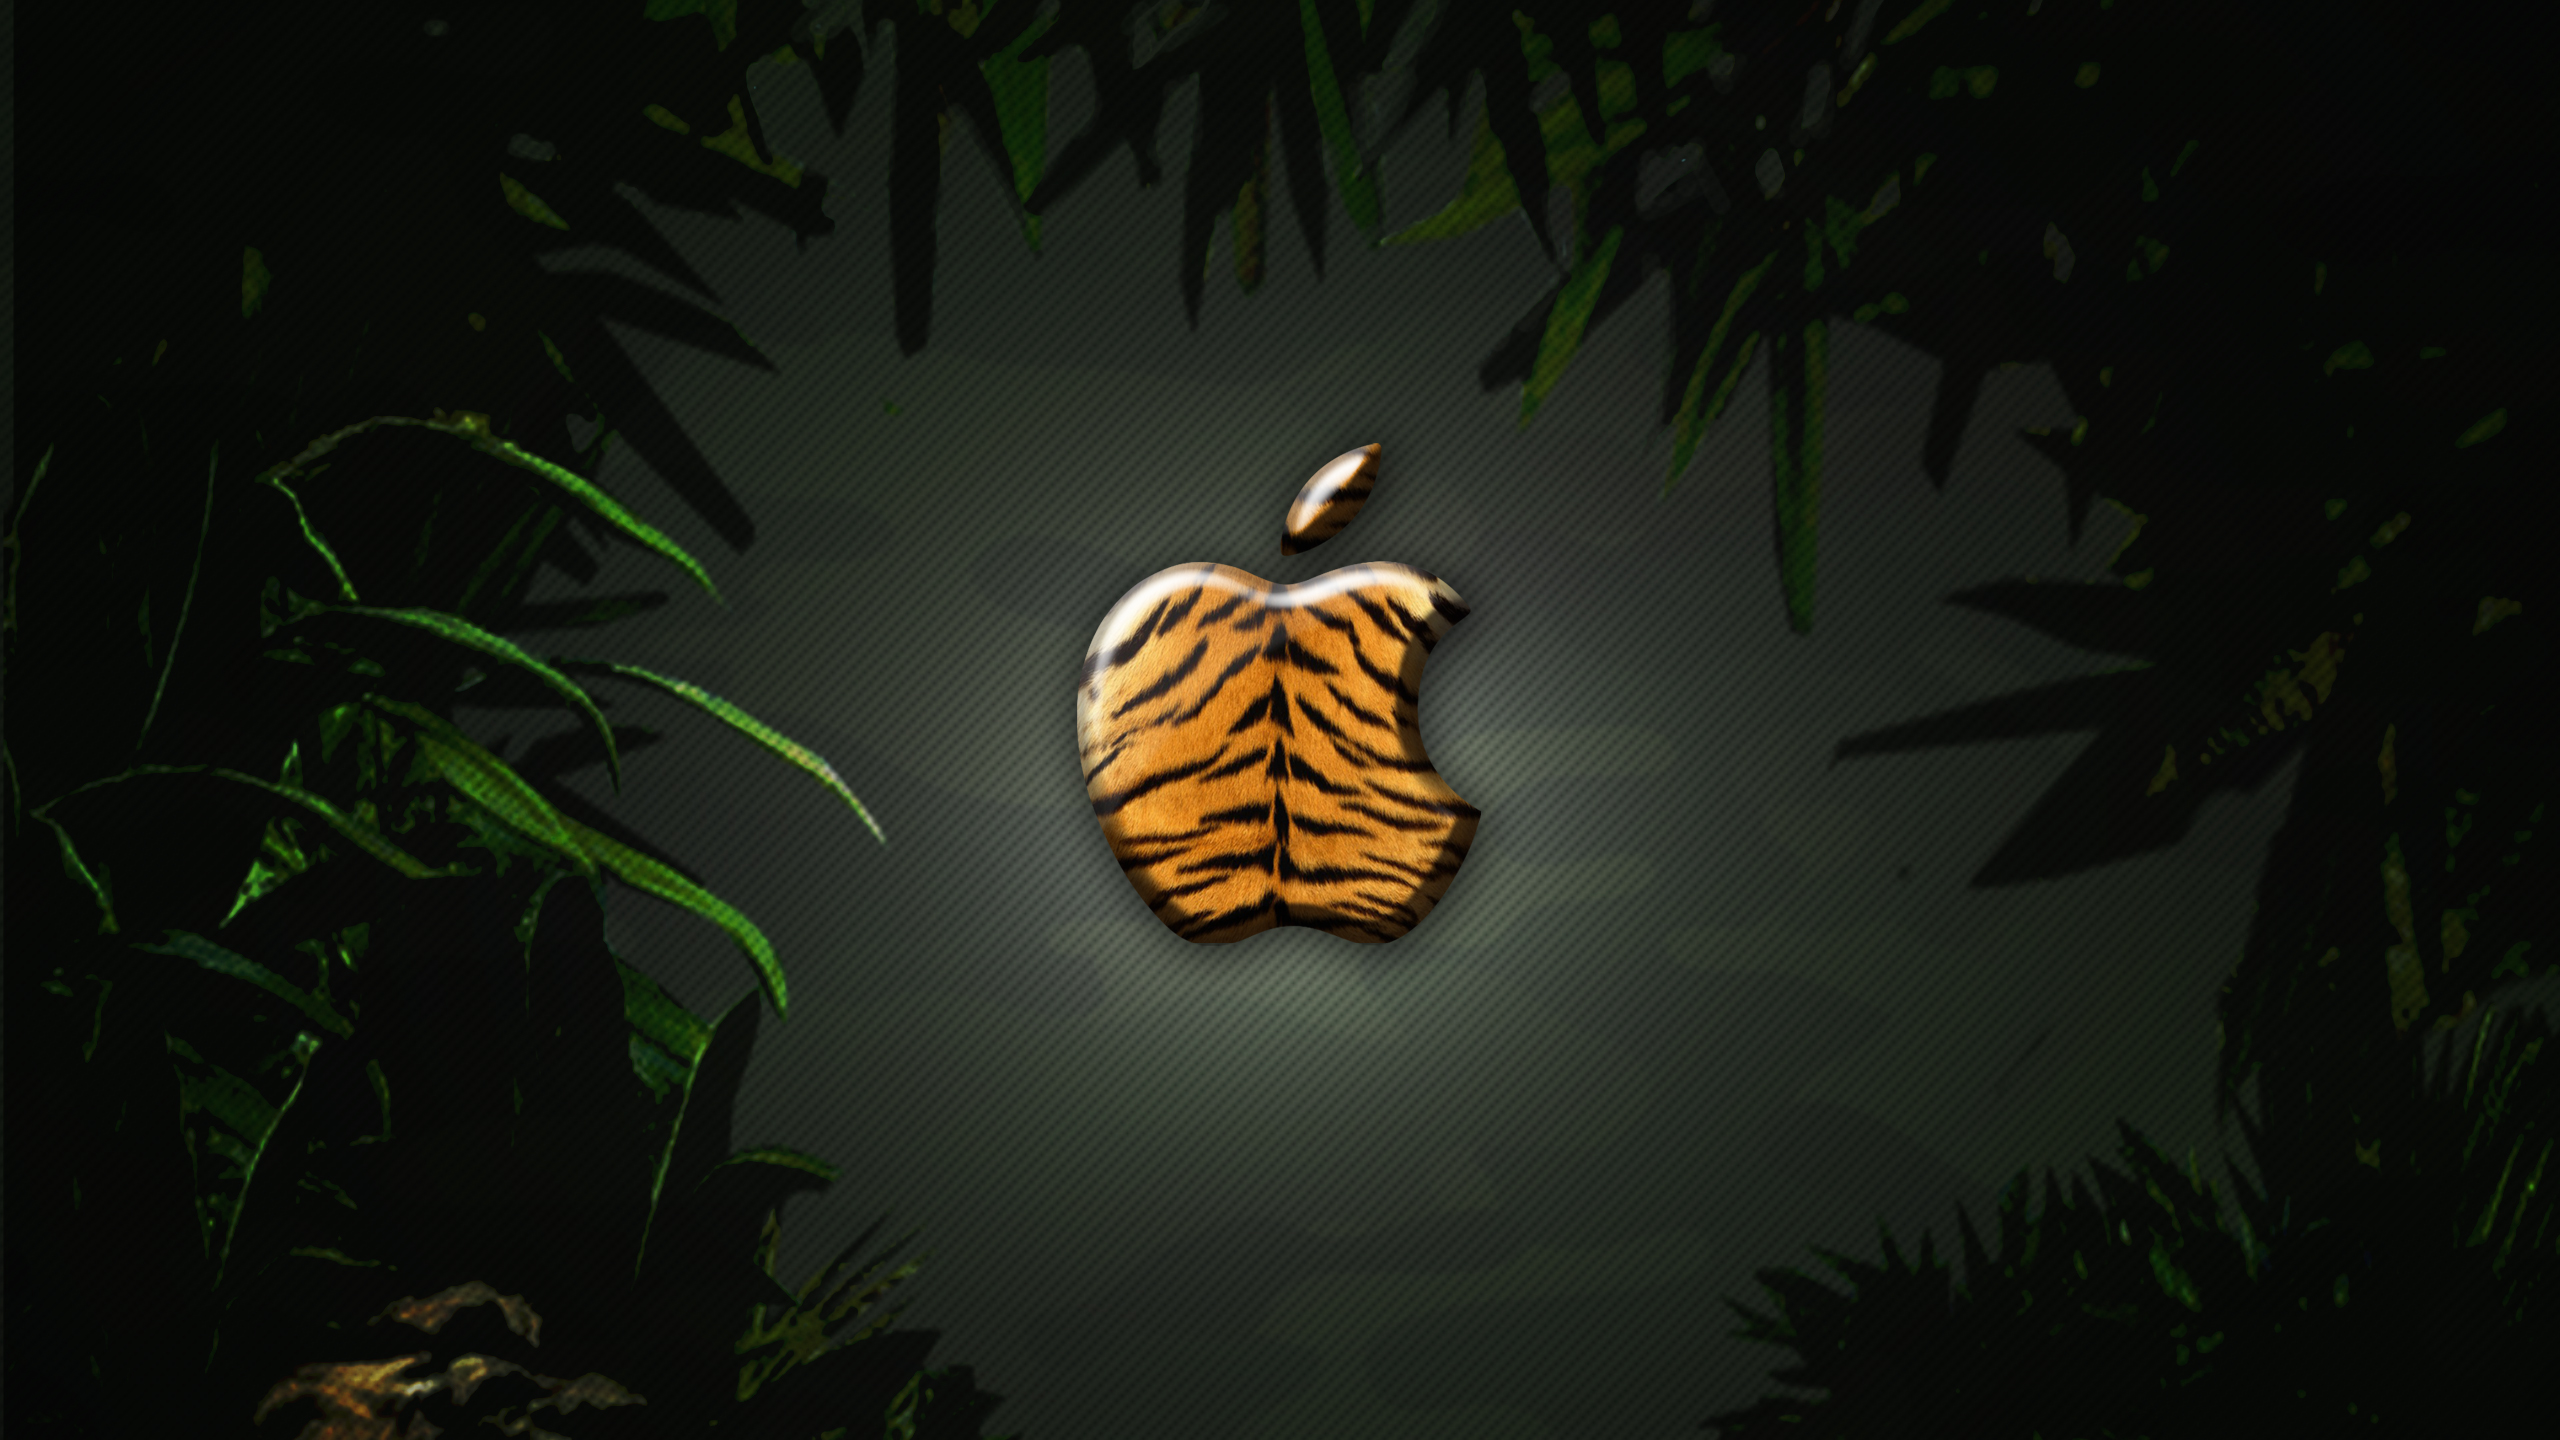 Apple Tiger LaggDogg Wallpapers 2560x1440